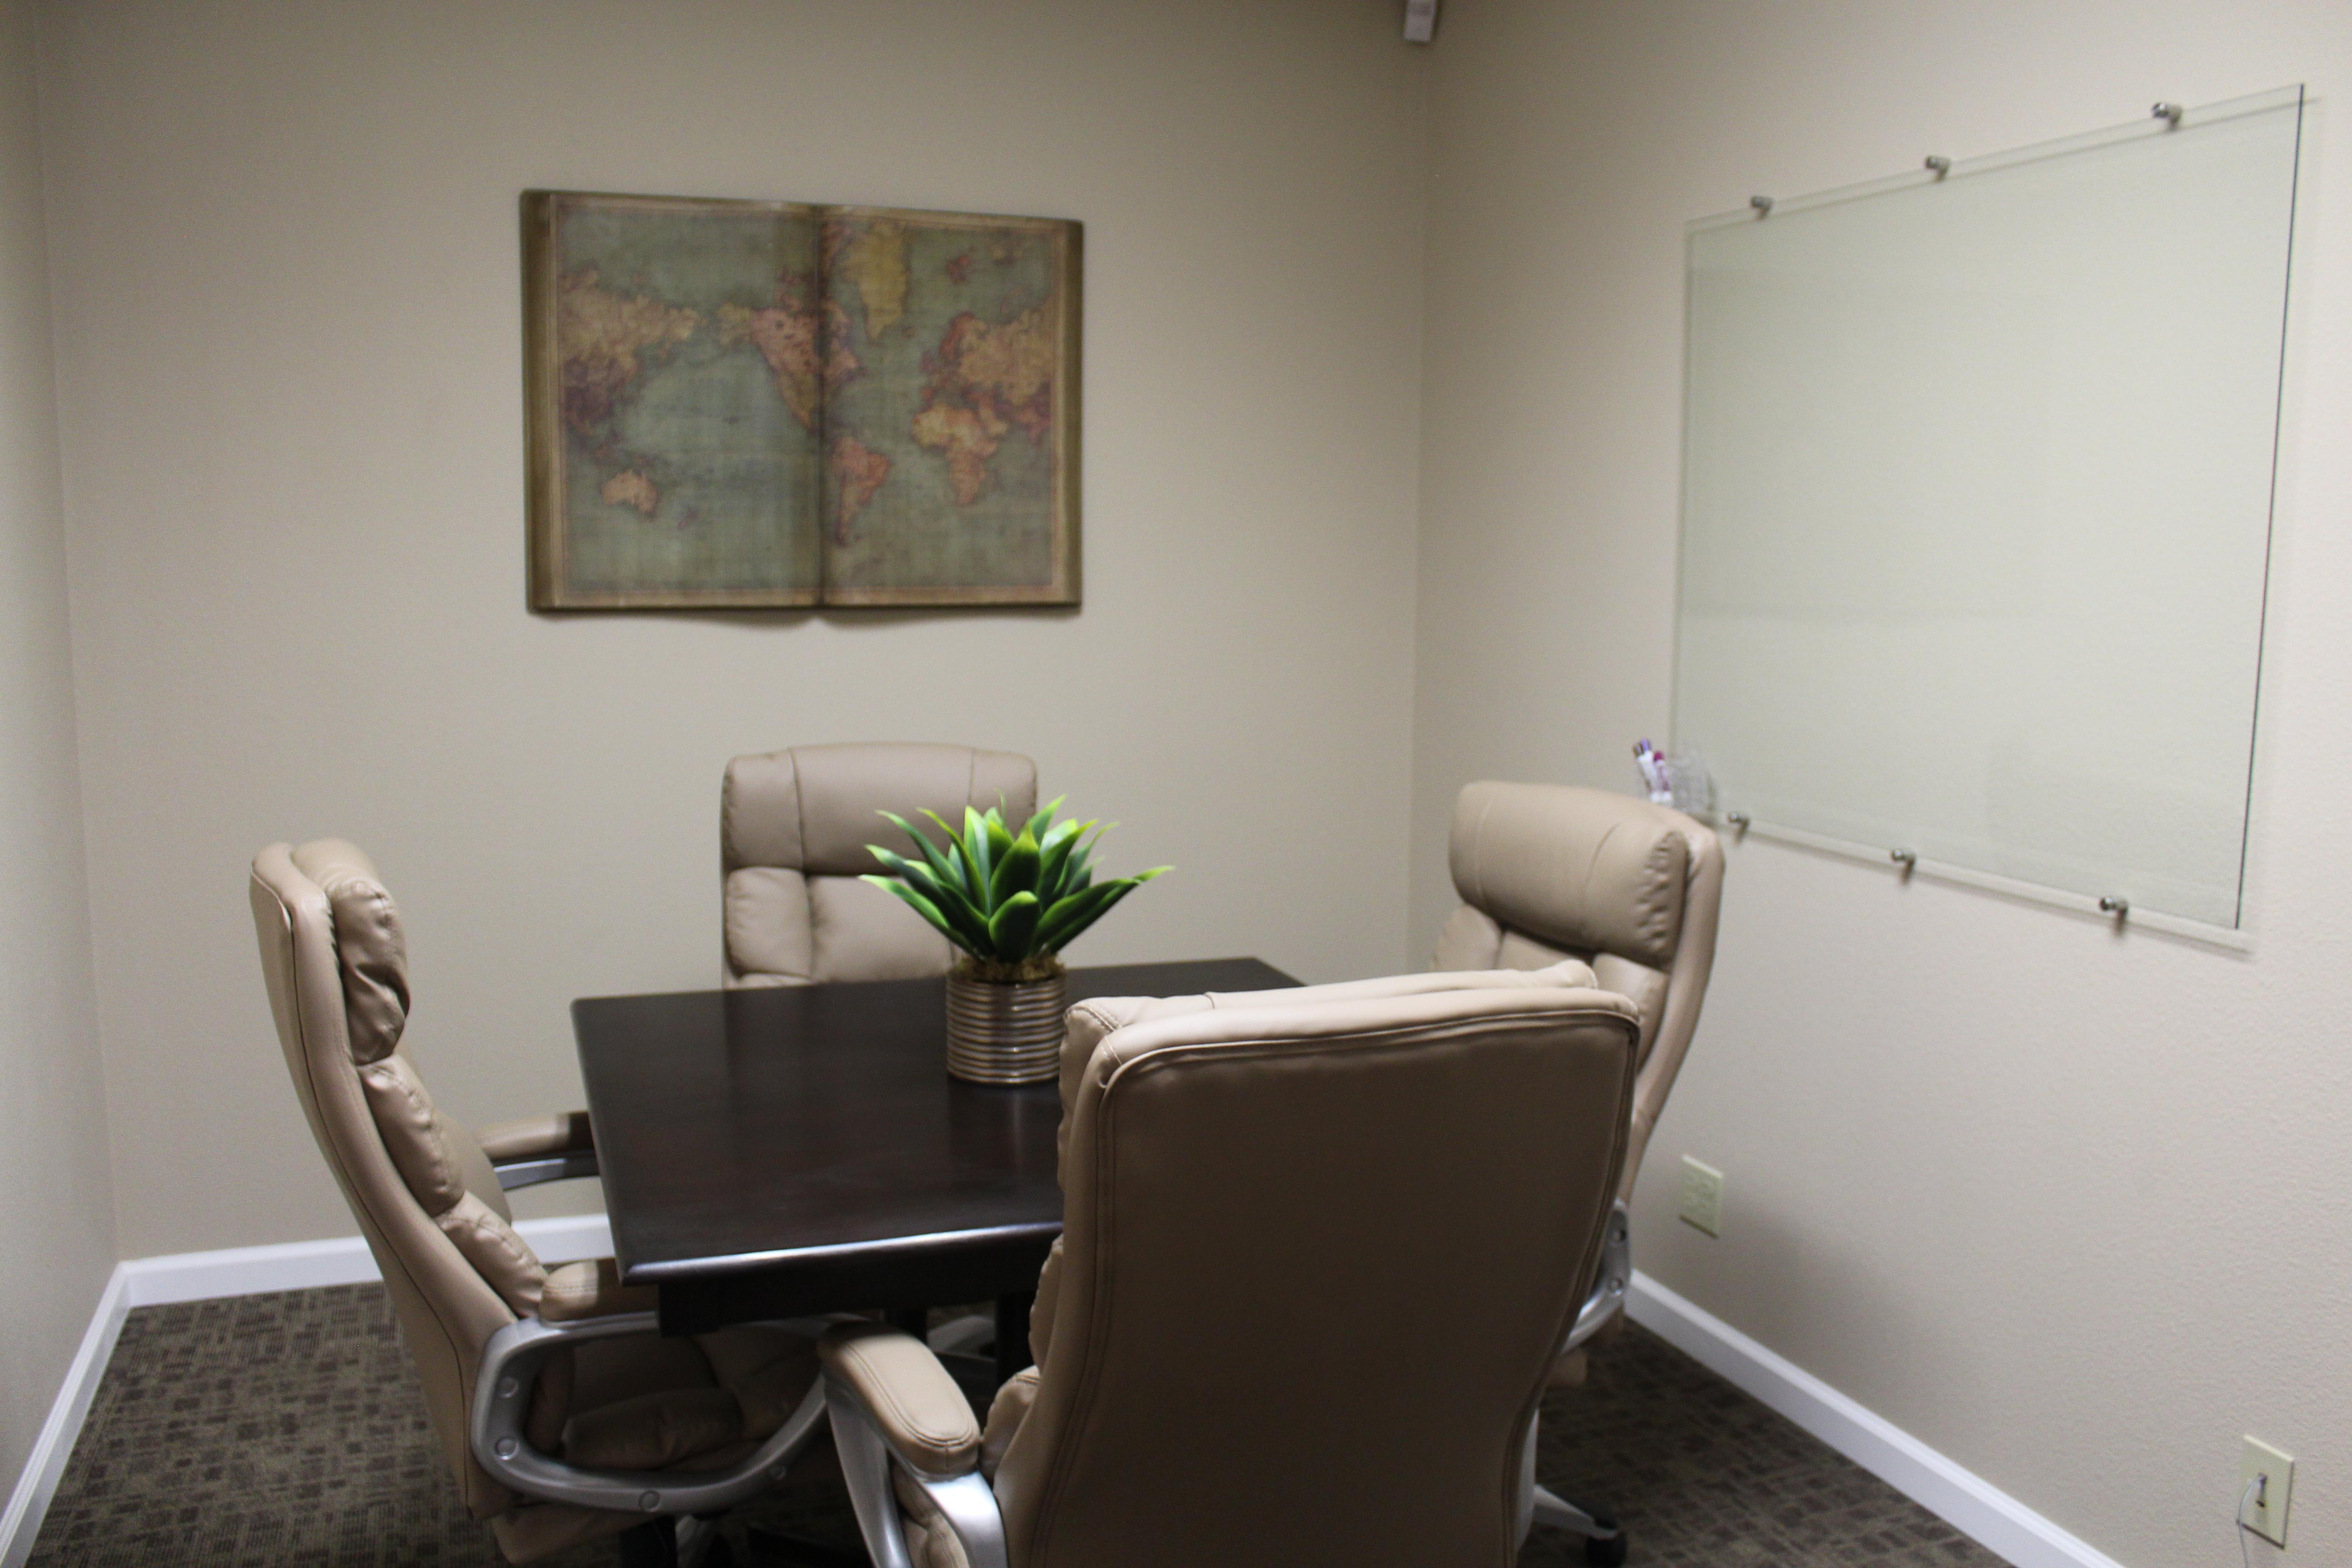 Britannica 4 Person Via Avalon Executive Suites